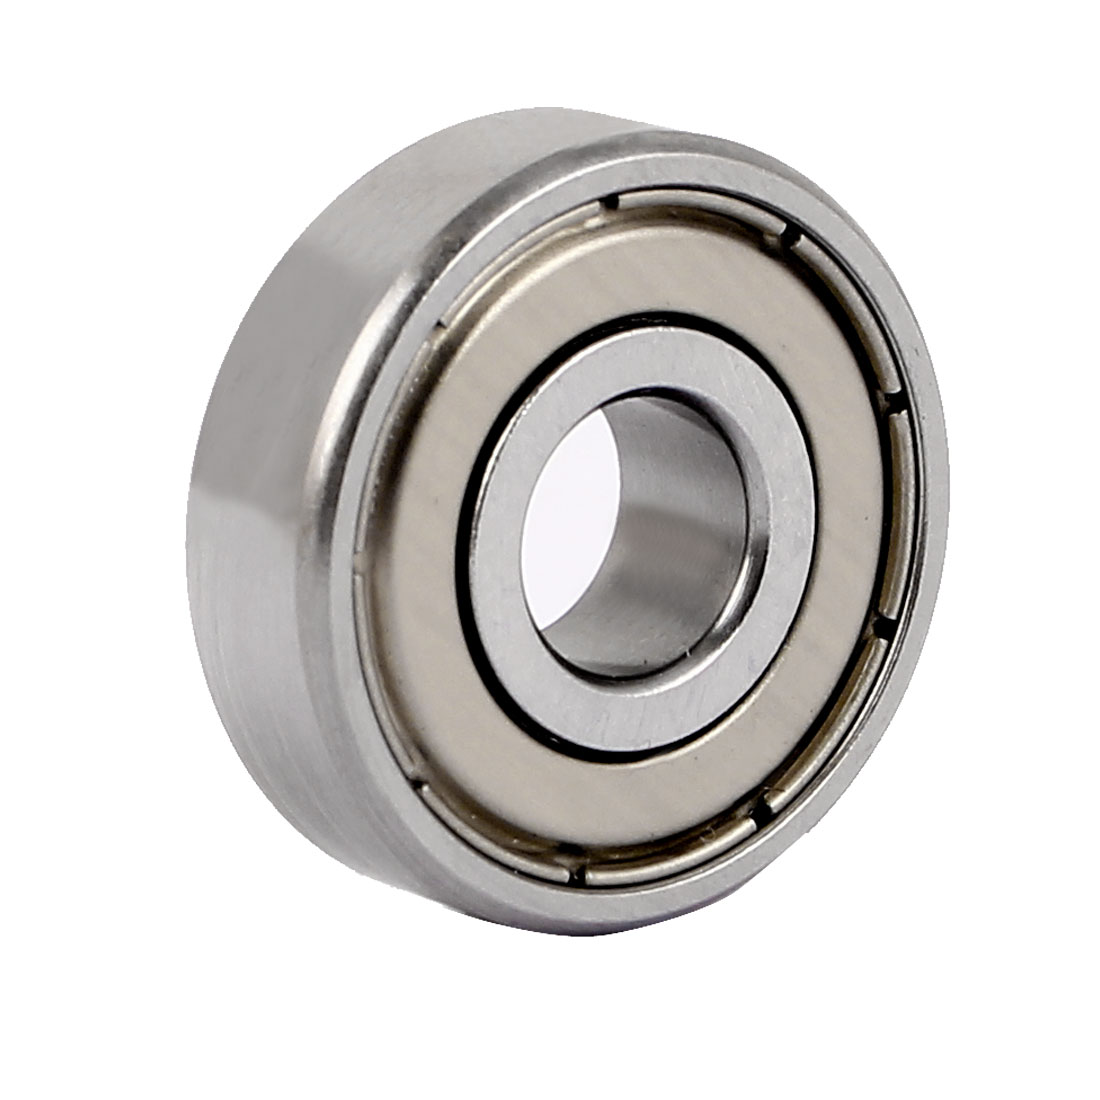 ZZ6301 37mmx12mmx12mm Single Row Deep Groove Shielded Ball Bearing